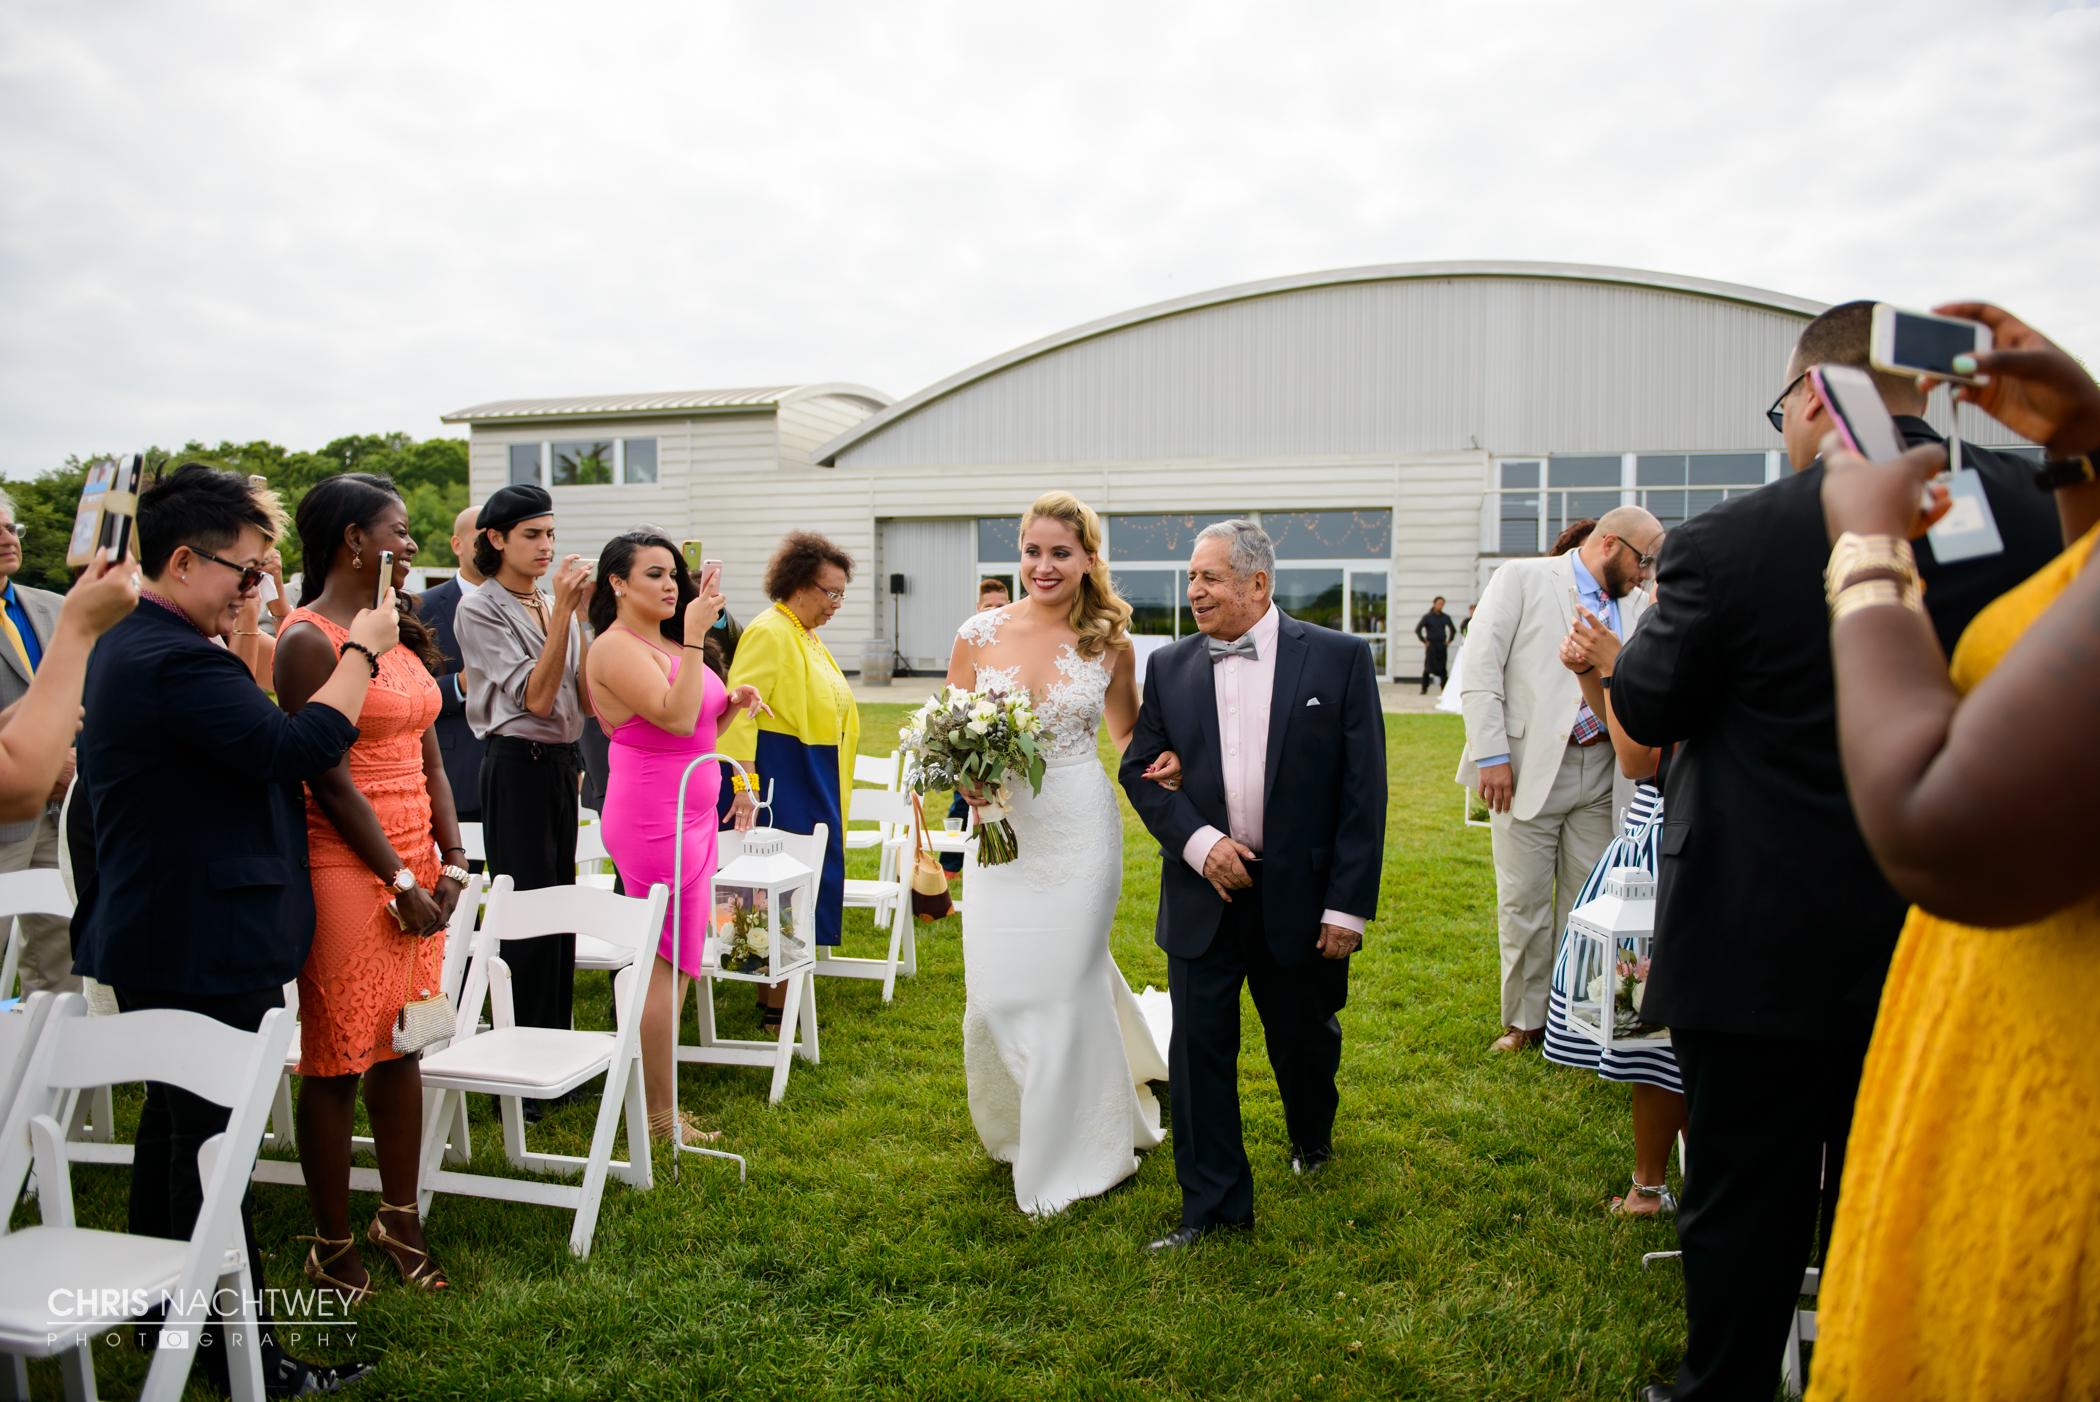 wedding-saltwater-farm-vineyard-photos-stonington-ct-chris-nachtwey-photography-2016-ana-austin-19.jpg